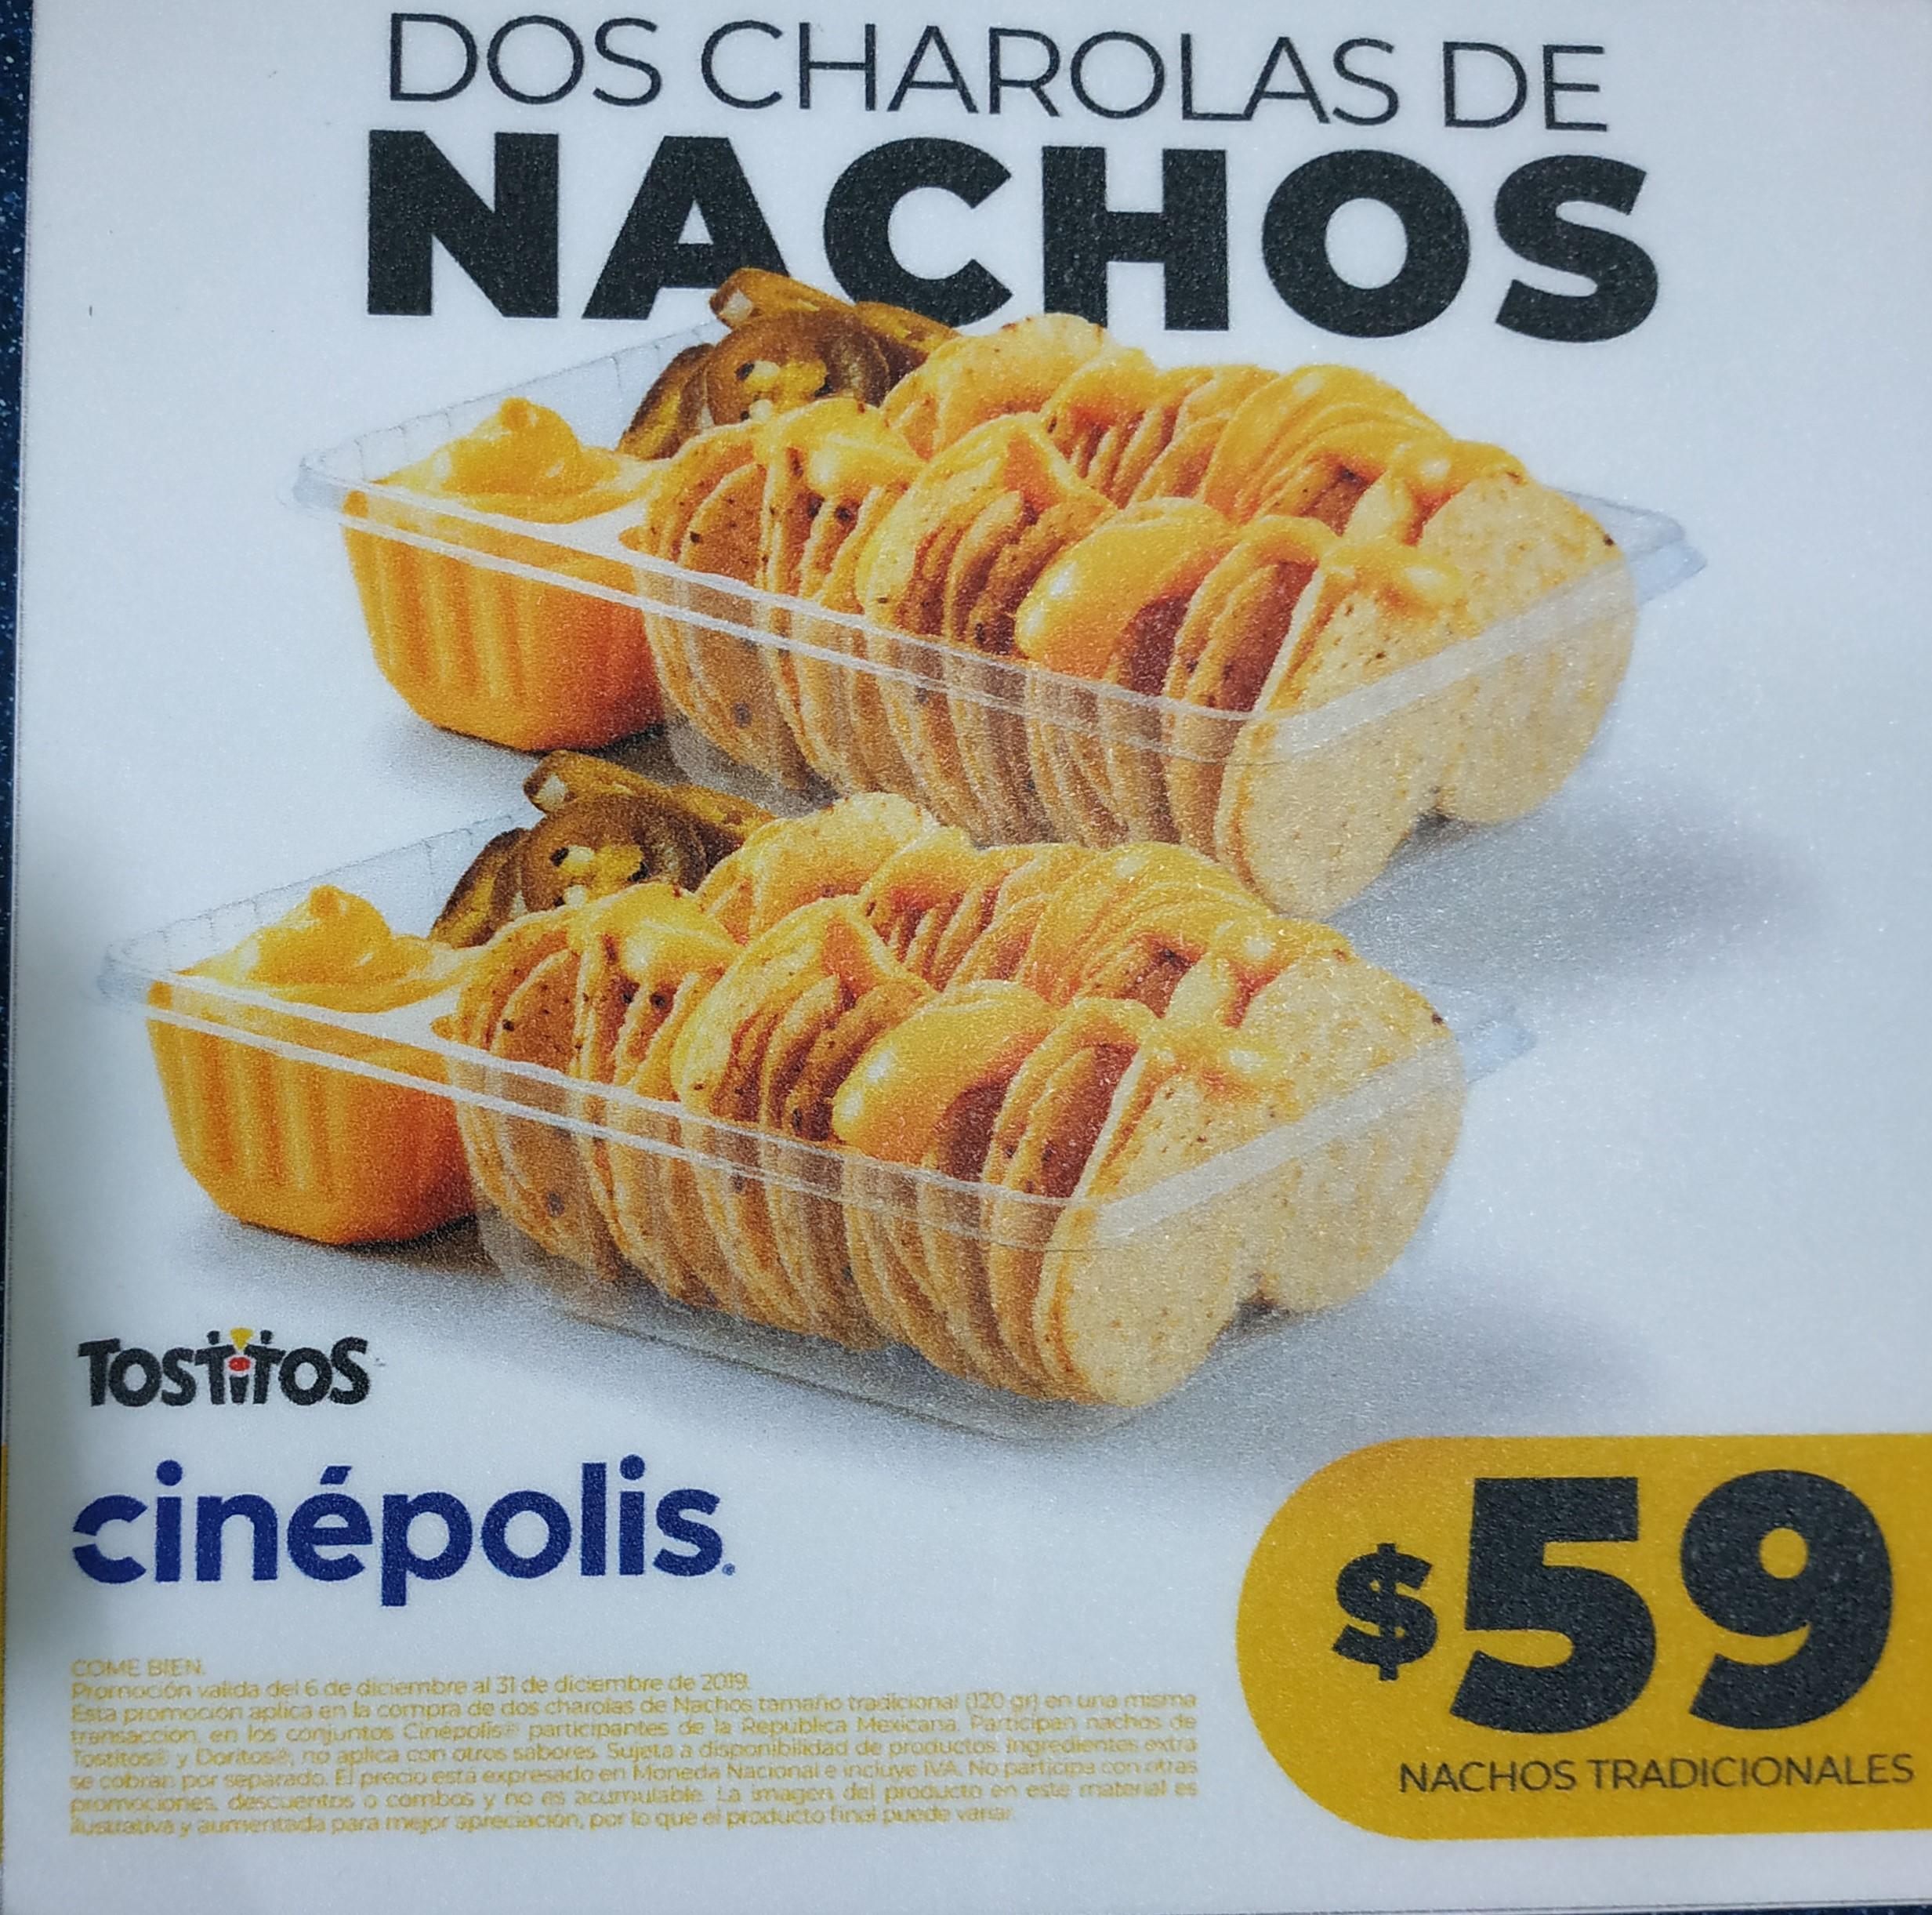 Cinepolis - 2 Charolas de Nachos